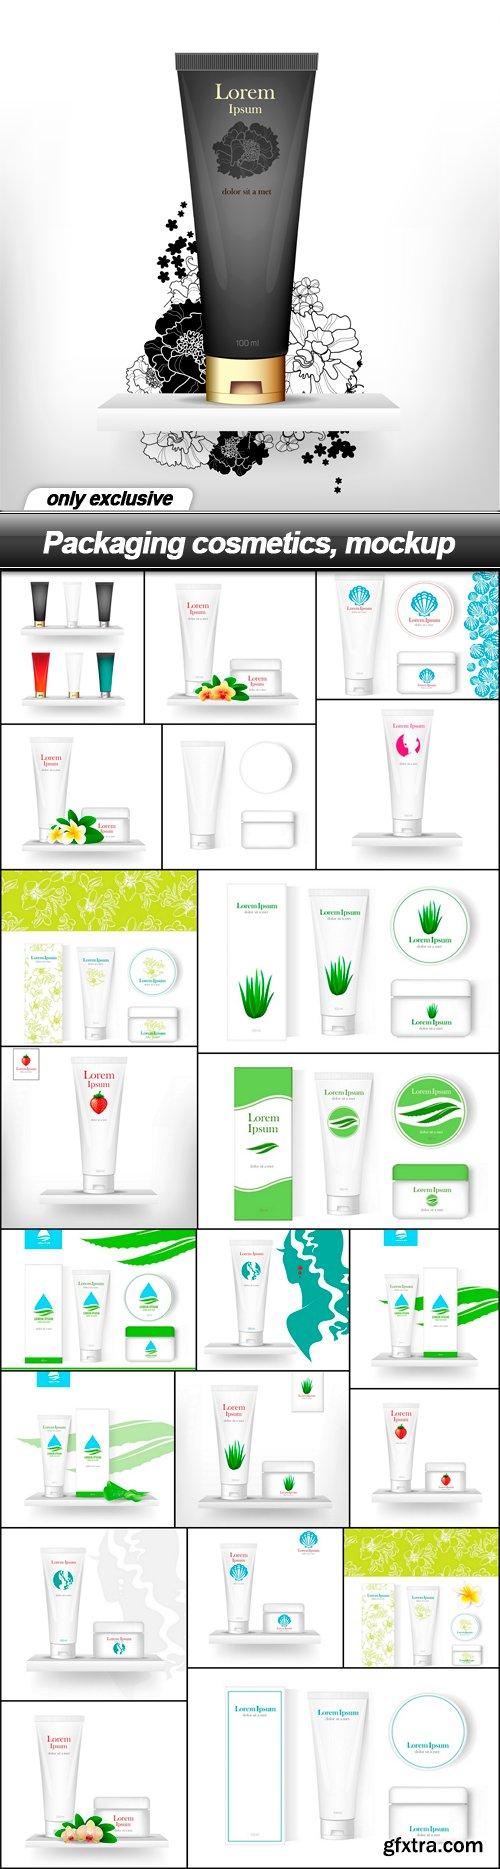 Packaging cosmetics, mockup - 22 EPS